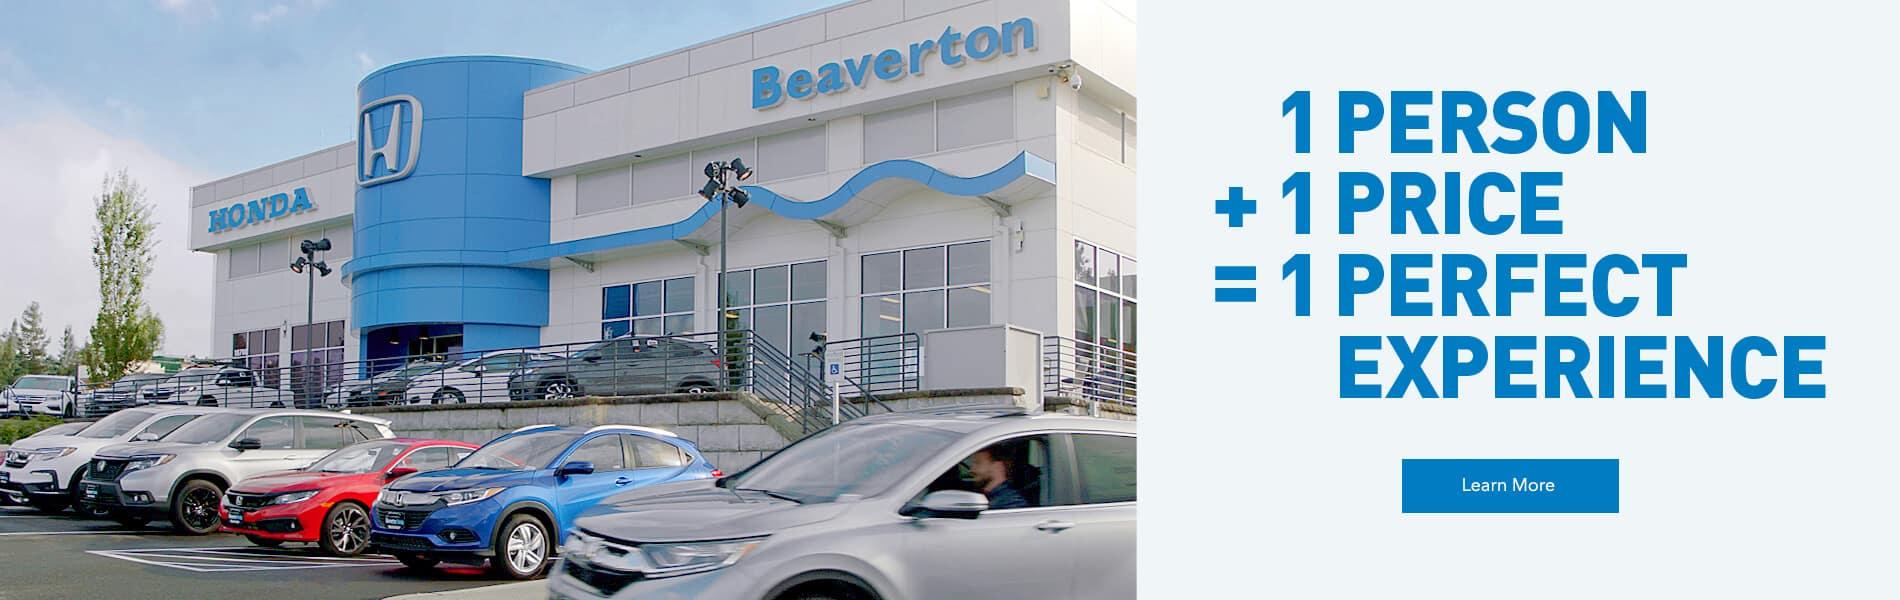 1 person plus 1 price equals 1 perfect experience. Bob Lanphere's Beaverton Honda